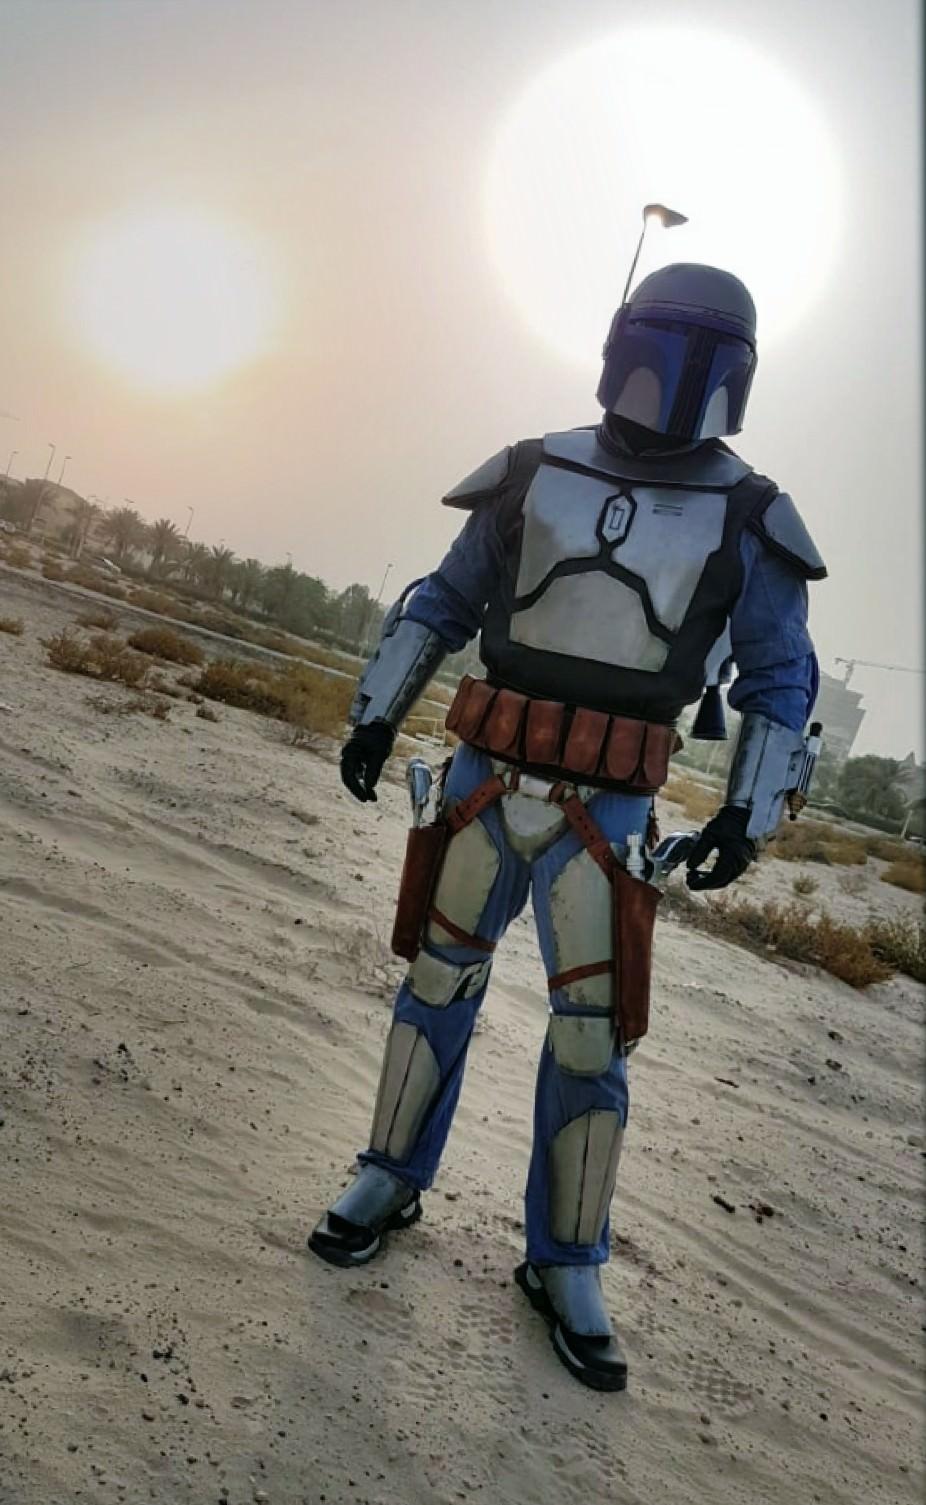 My cleared Jango Fett costume with 501st Legion